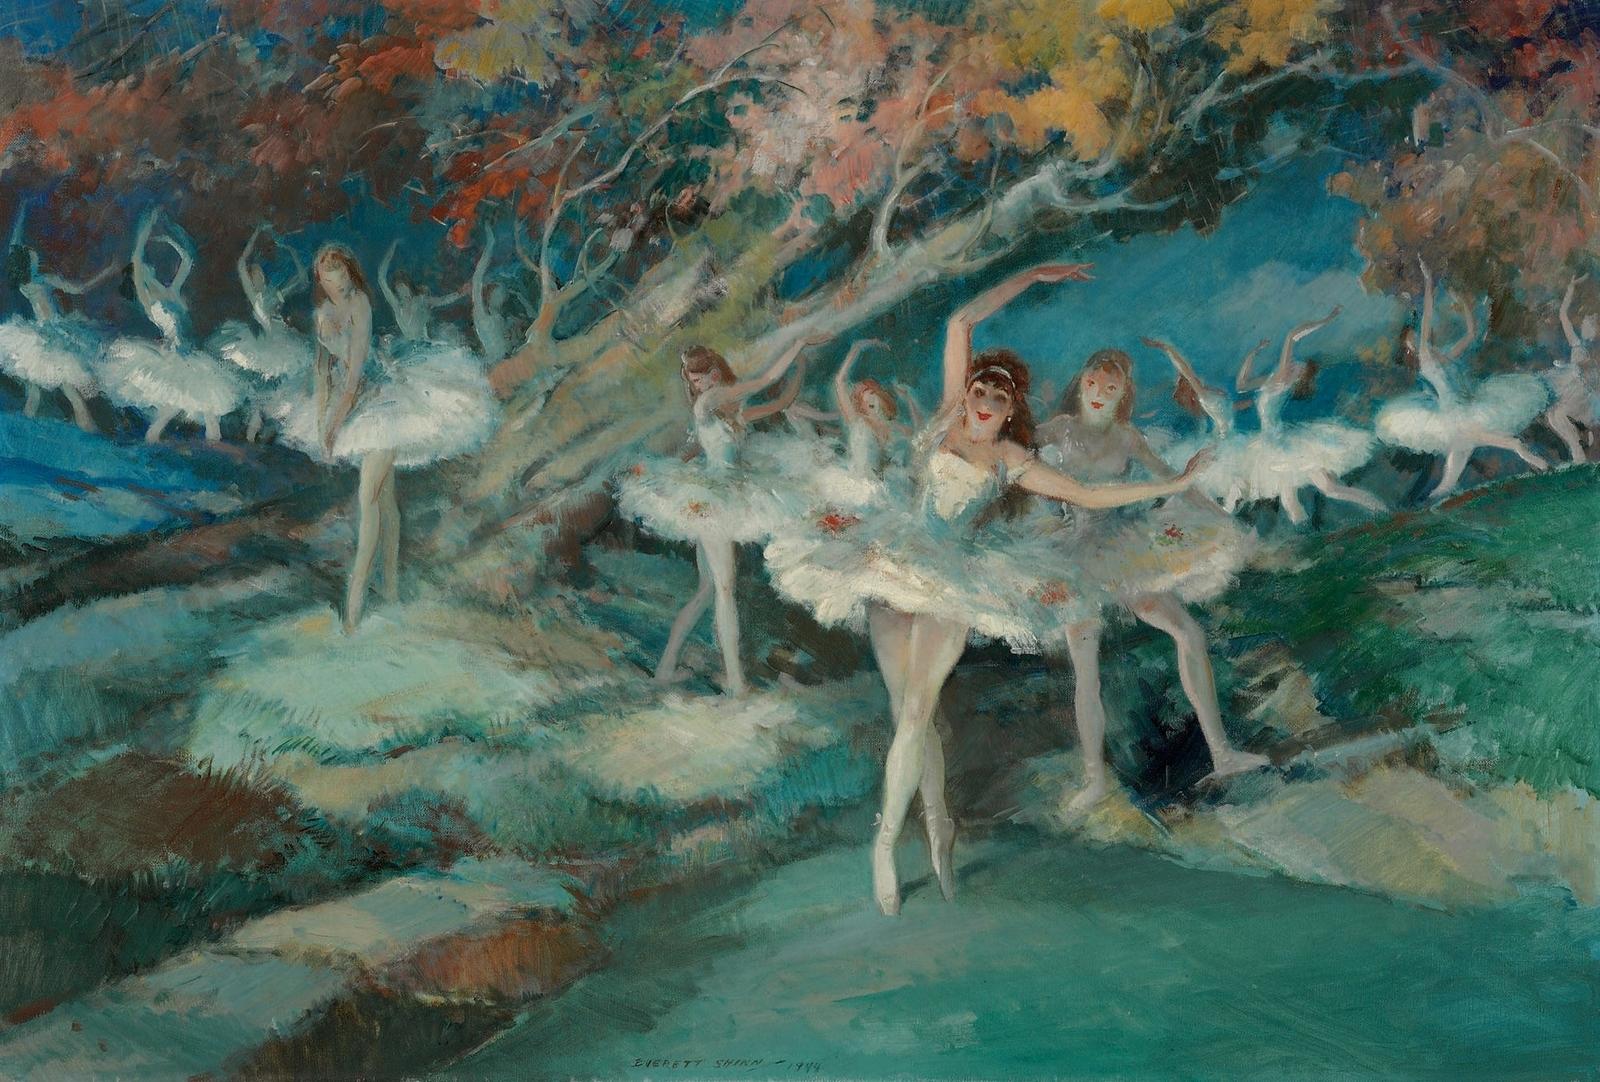 1944_Балет (Ballet)_53.3 x 78.8_х.,м._Частное собрание.jpg